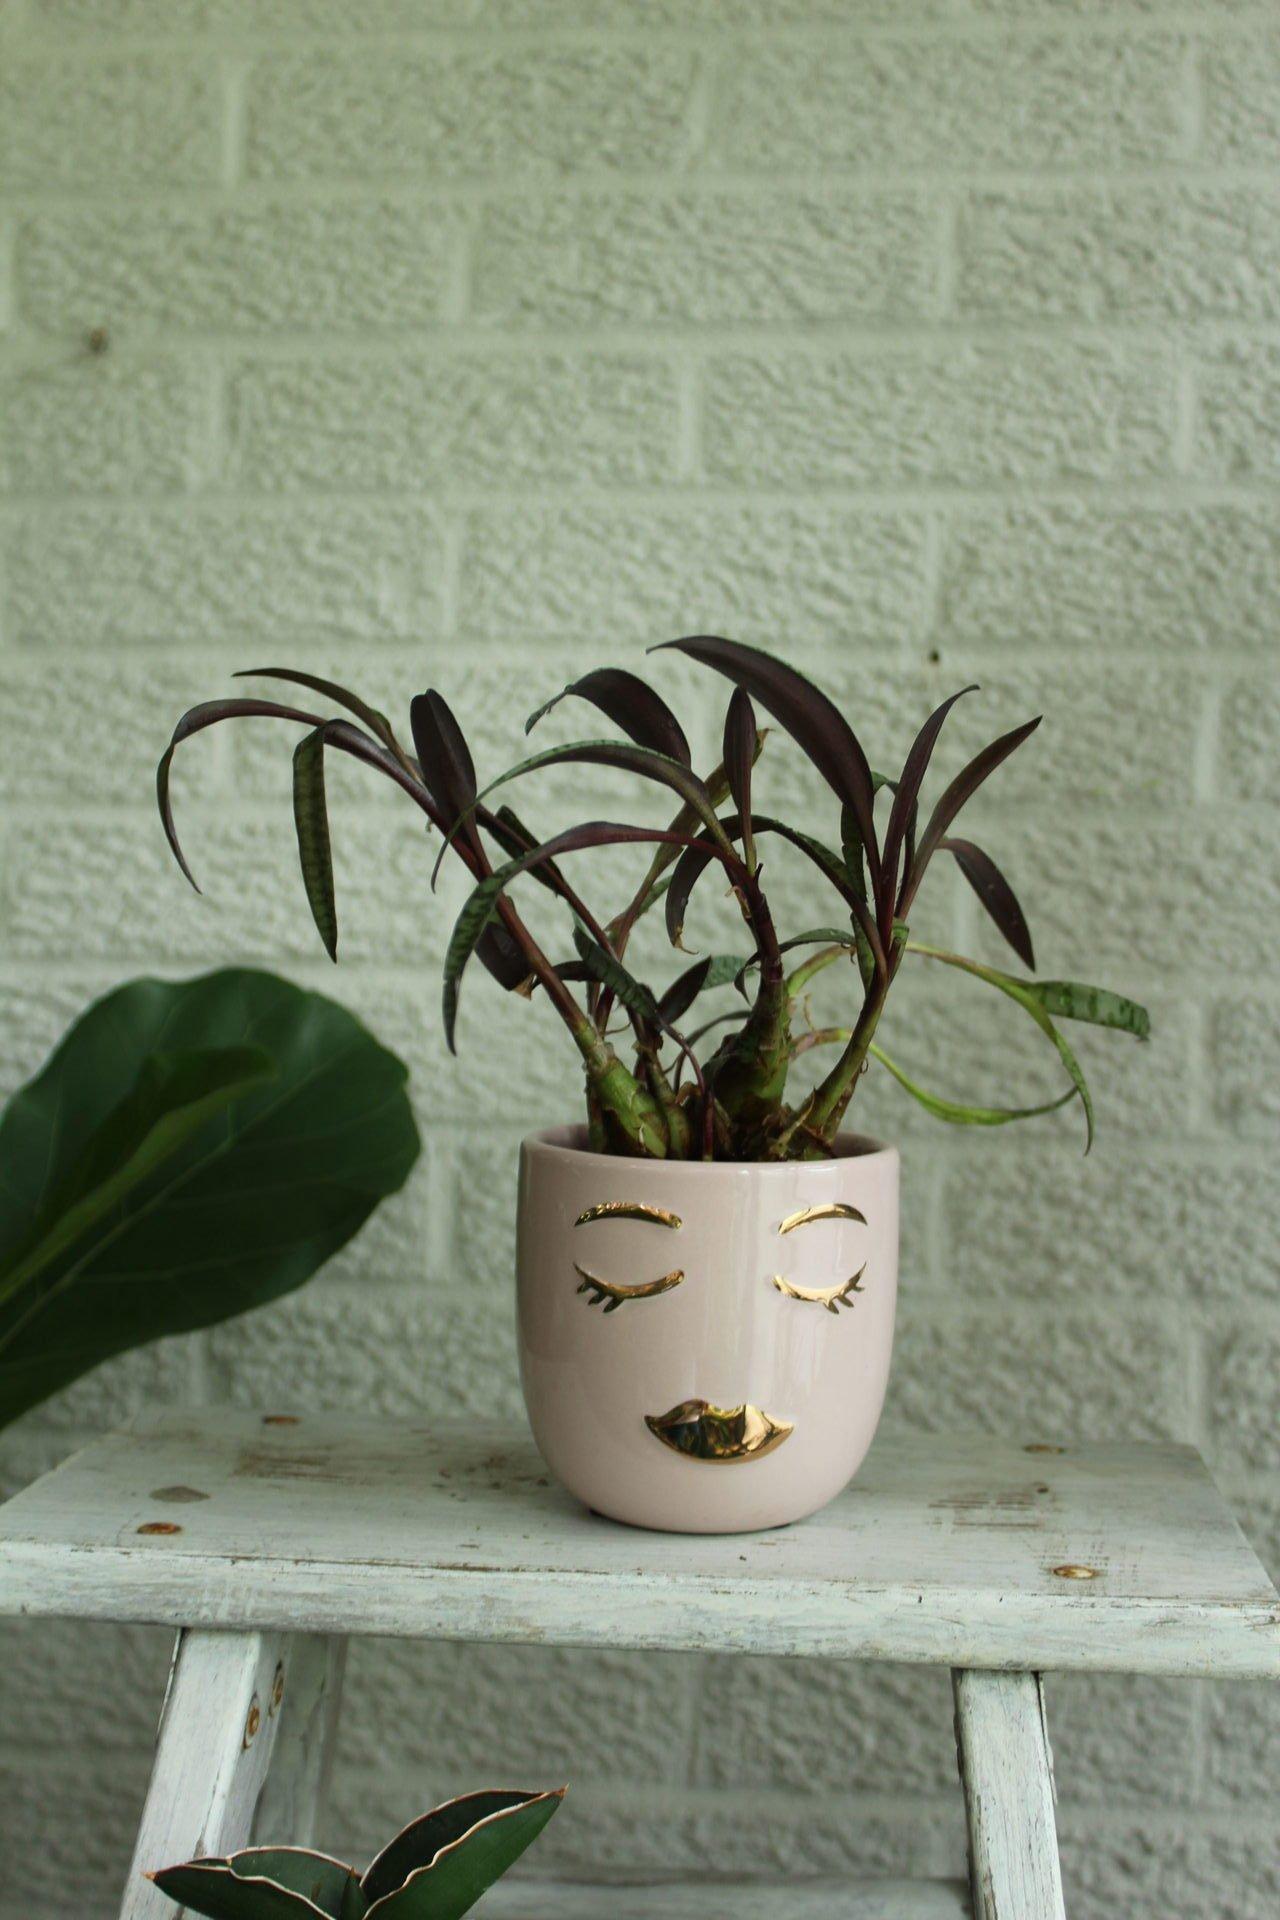 Ledebouria face vase